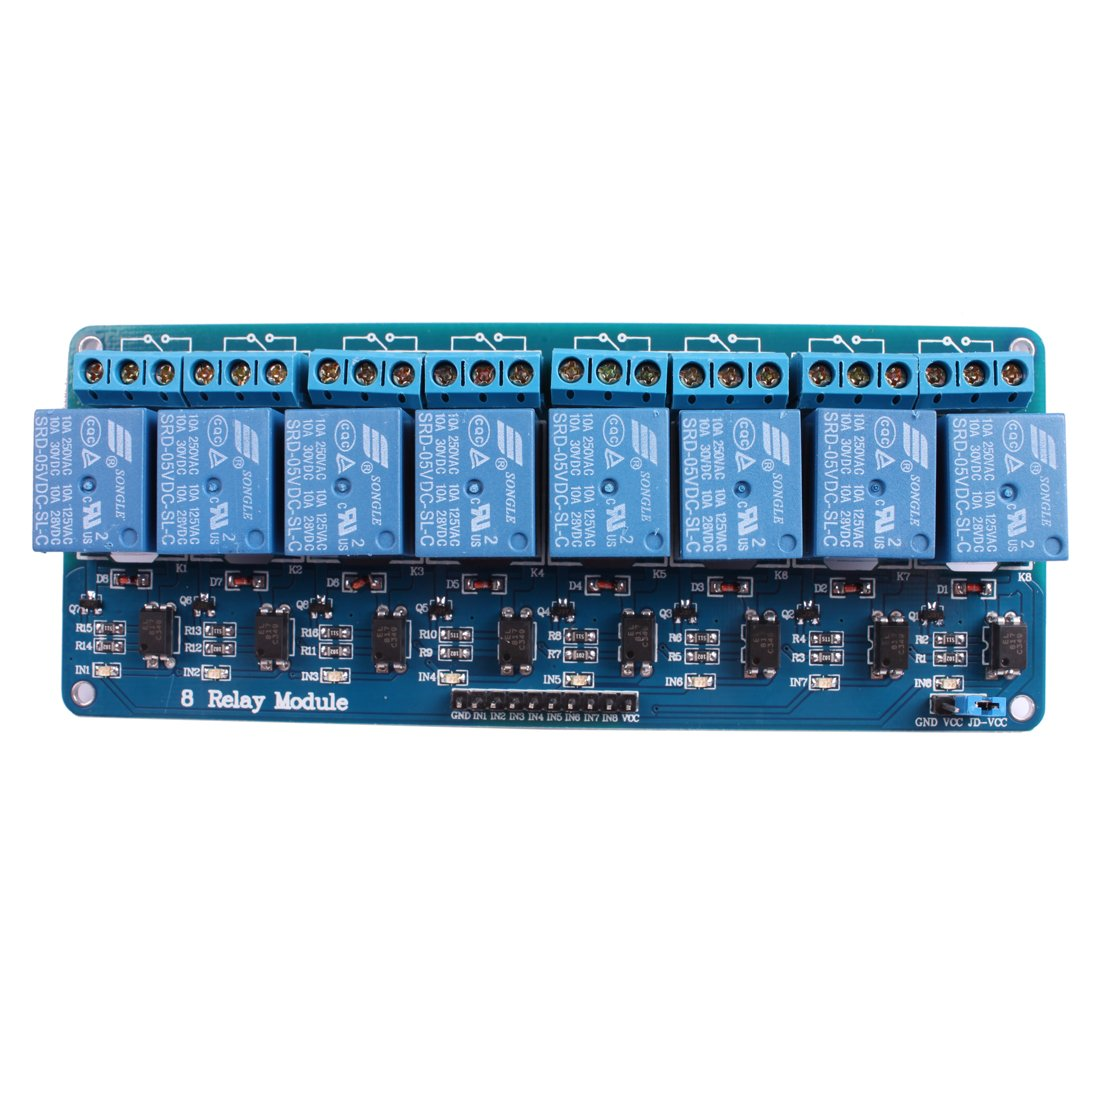 Relay Board For Arduino Jbtek 8 Channel Dc 5v Module Raspberry Pi Dsp Avr Pic Arm